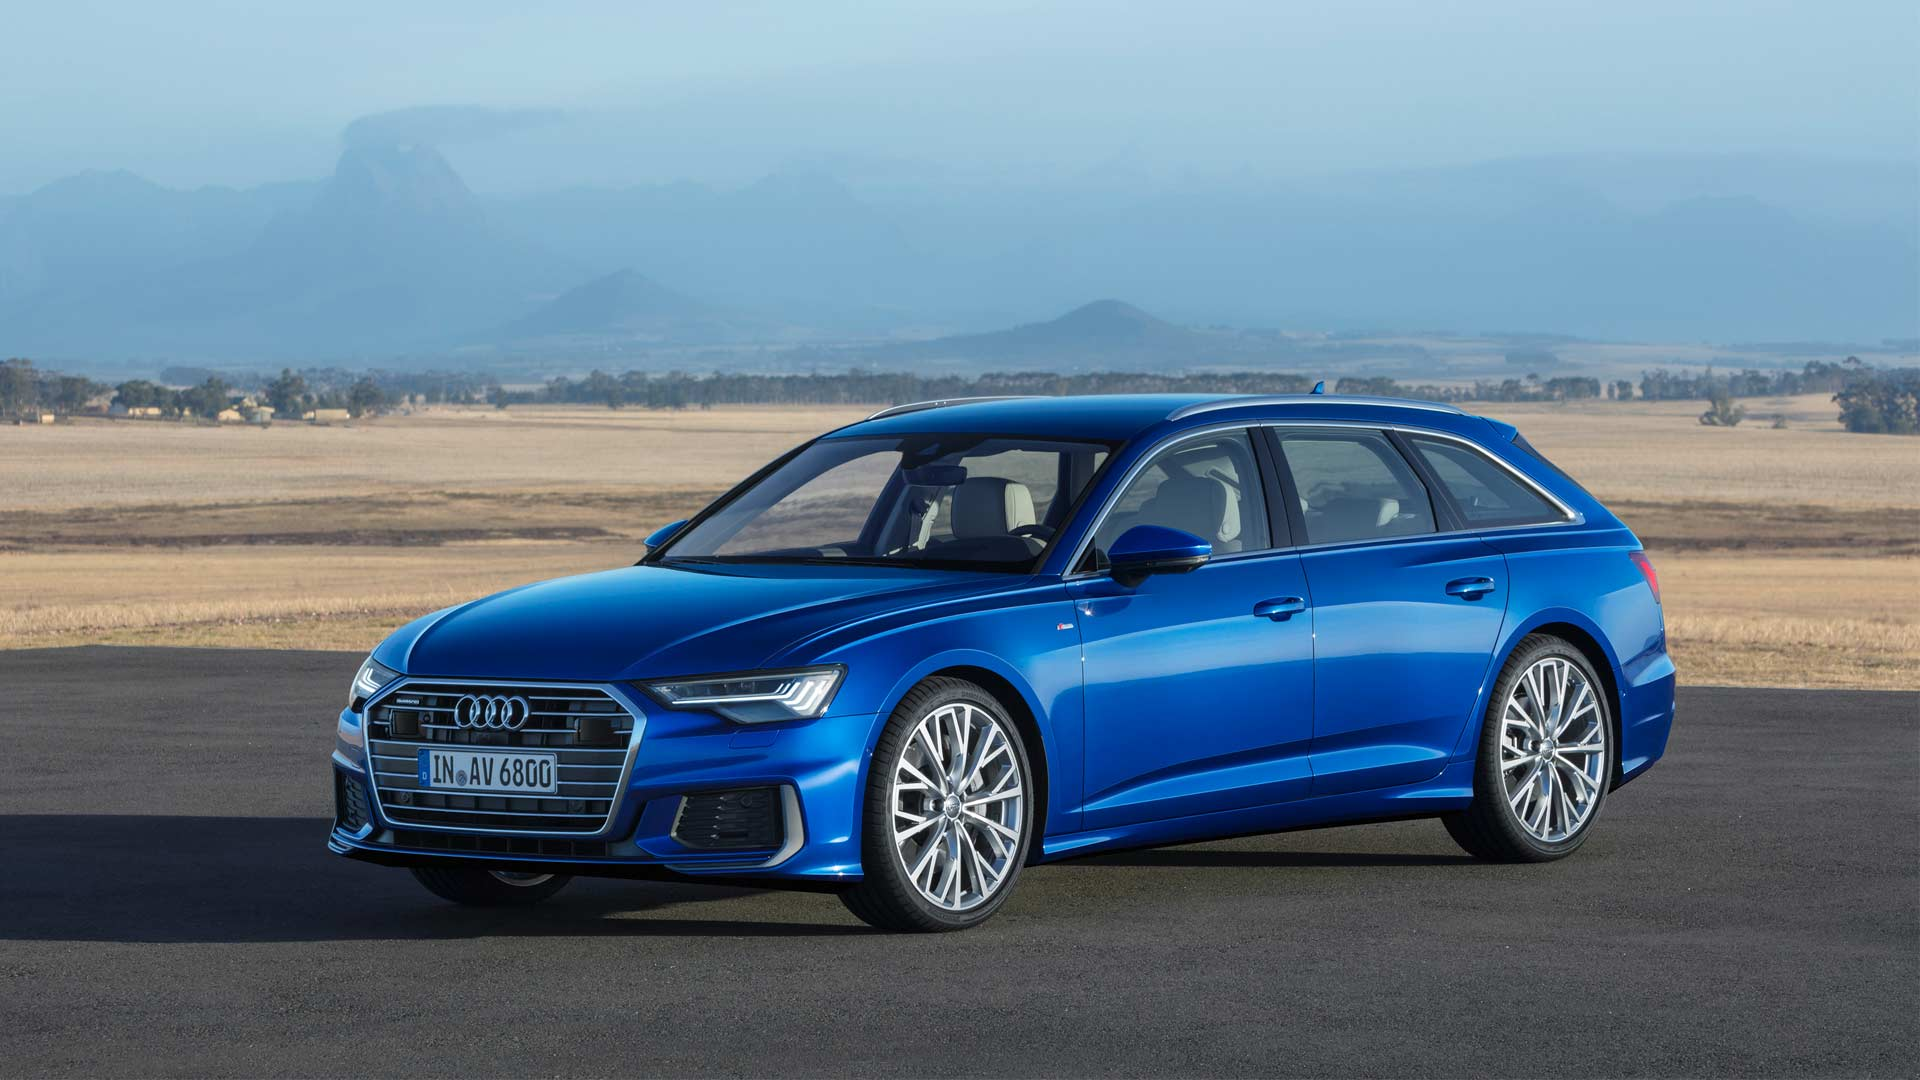 8th-generation-2018-Audi-A6-Avant_3